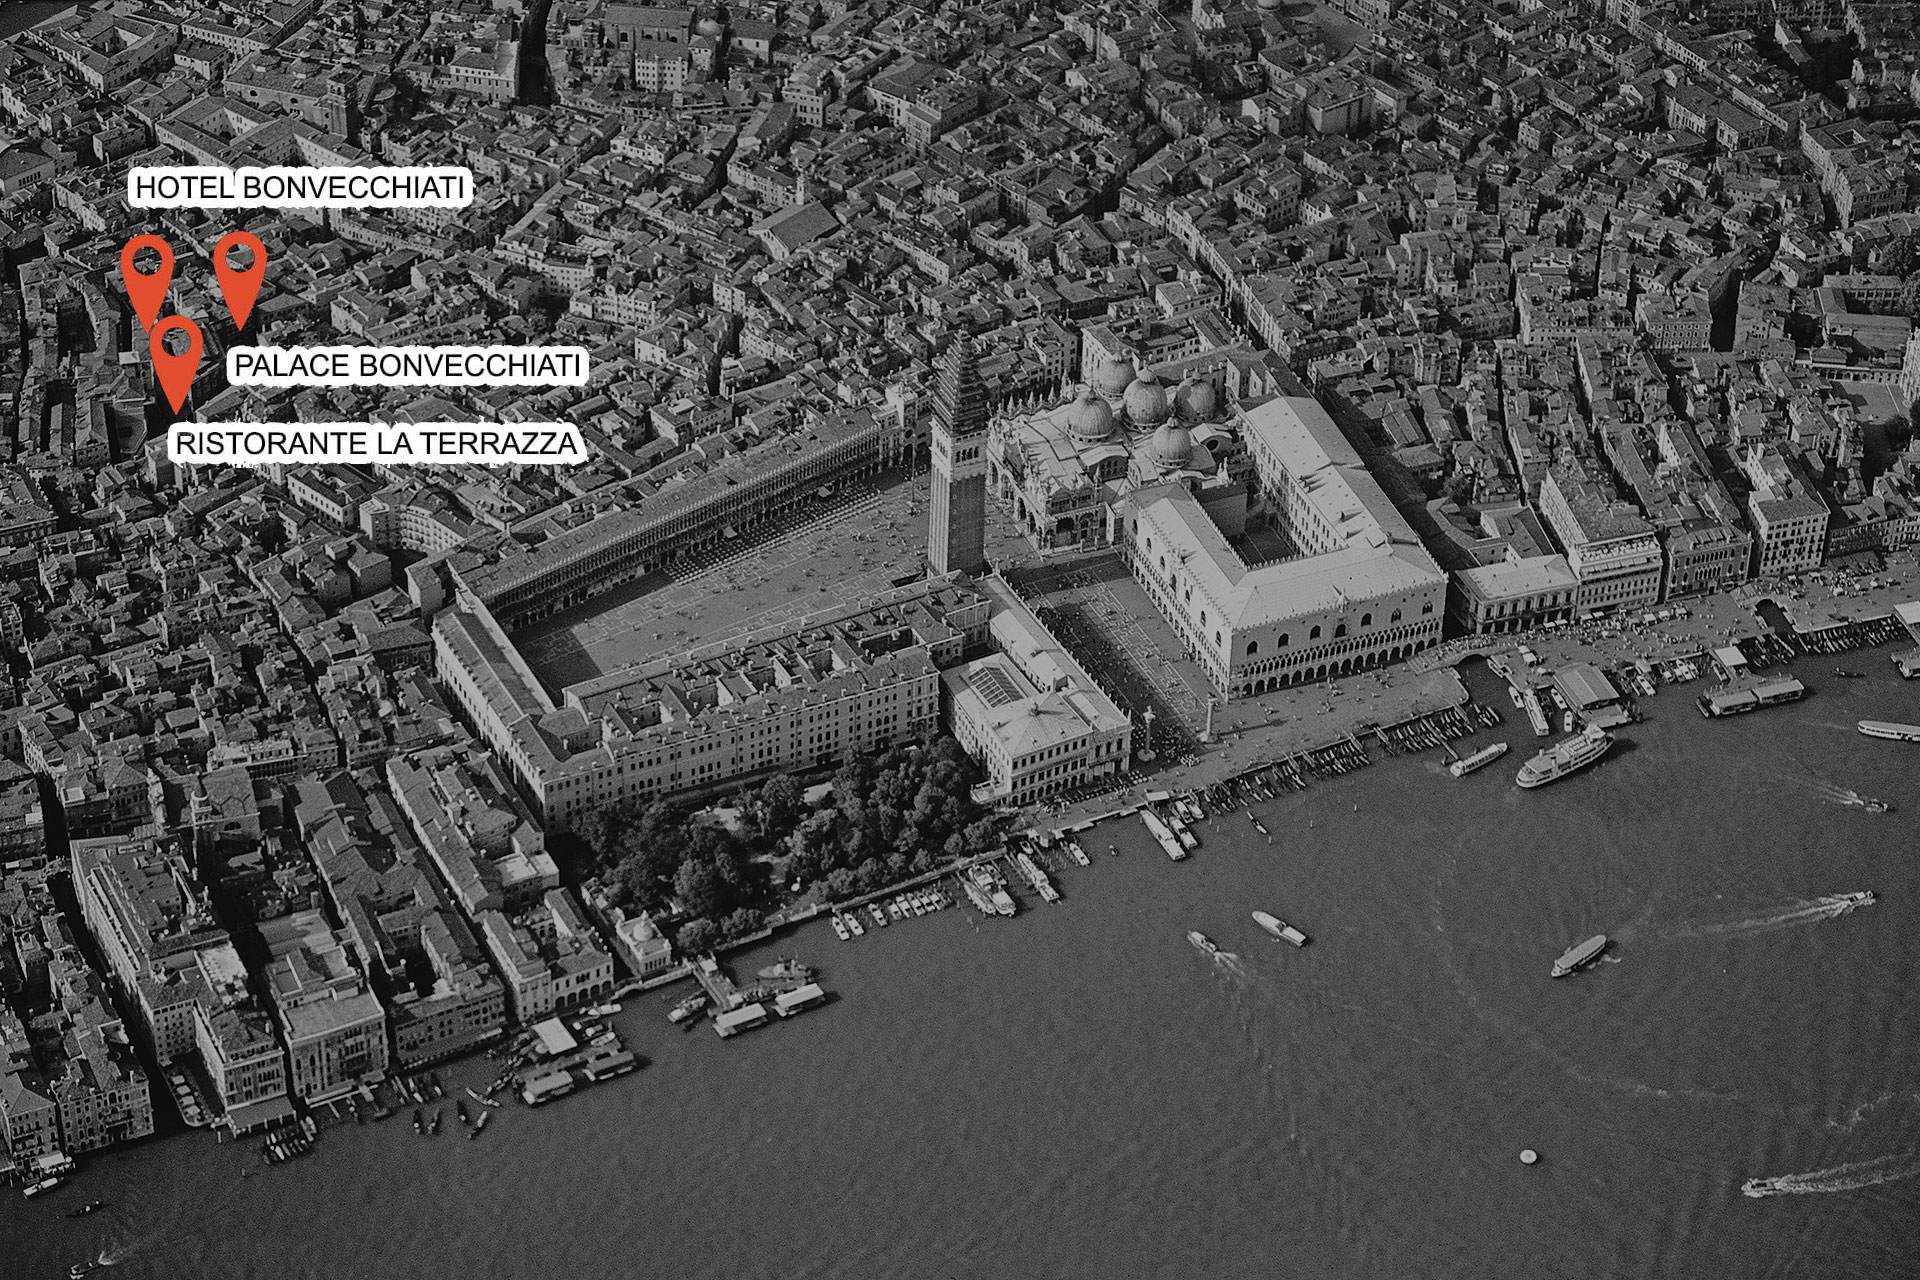 Luxury Hotels Venice St. Mark | Bonvecchiati Hotels Venice Official ...